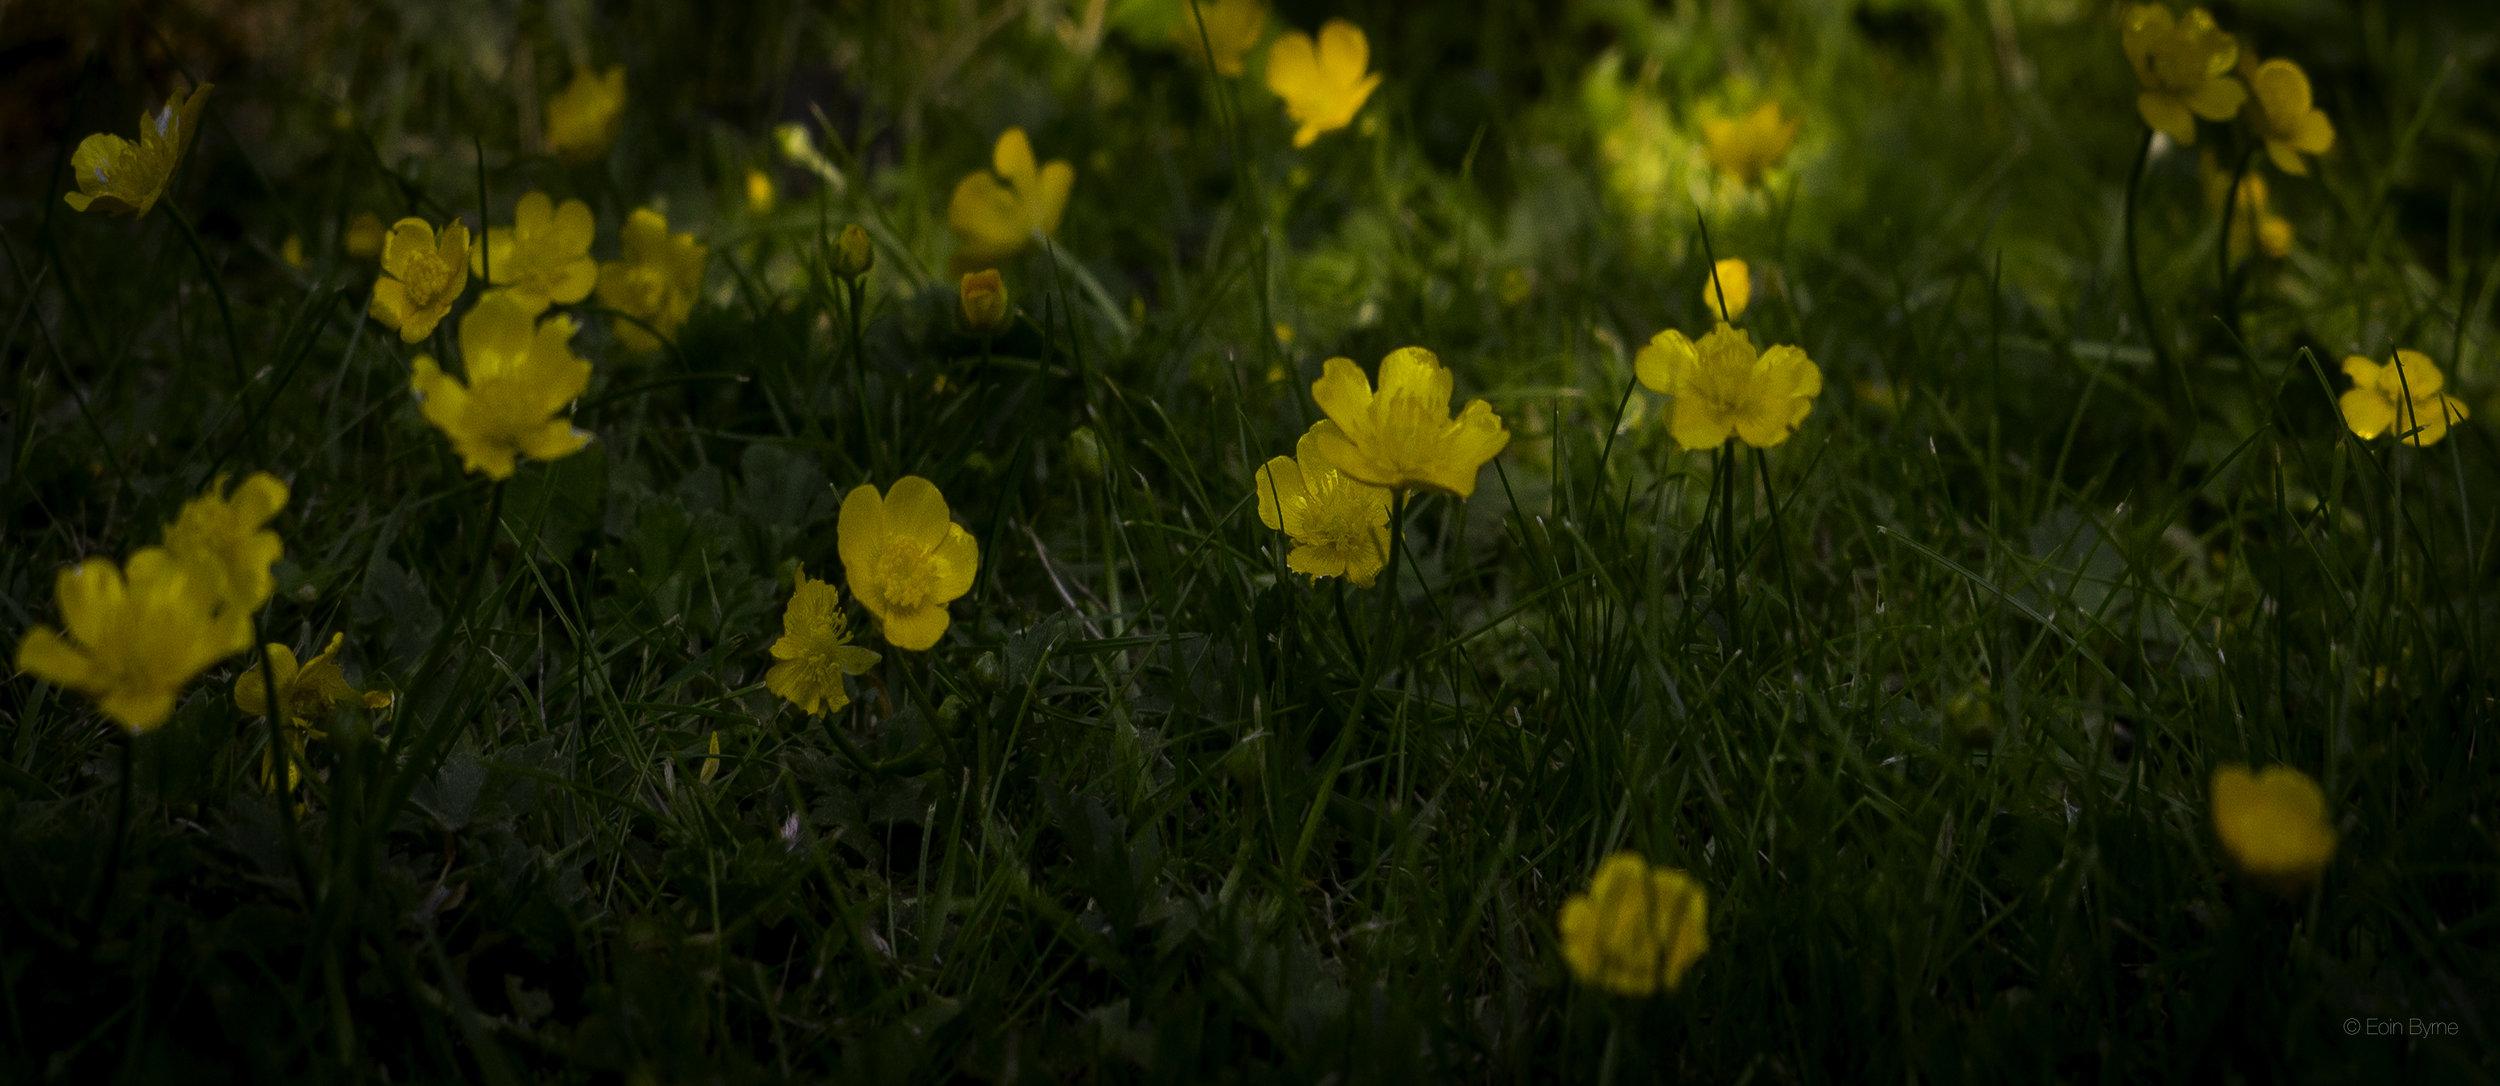 Buttercups in the late sun 2.jpg